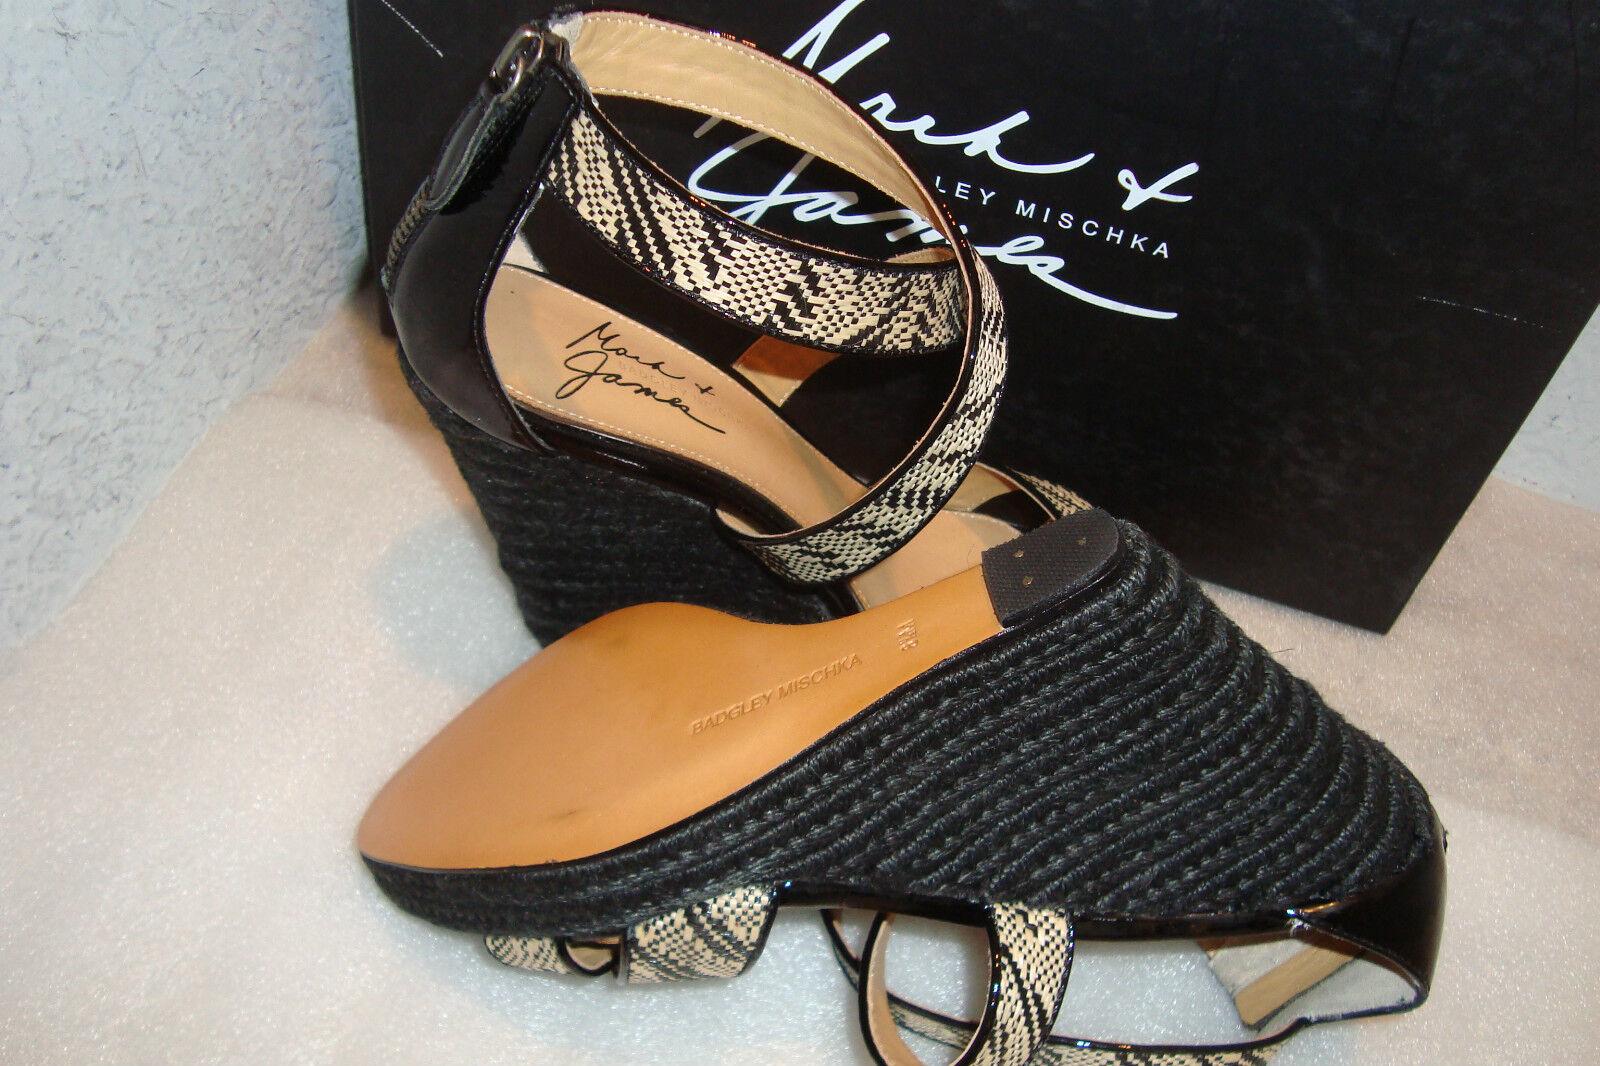 Mark & James BY Badgley Nat Mischka Damenschuhe Reza II Nat Badgley Blk Wedge Schuhes 8.5 M NEW ed9fda